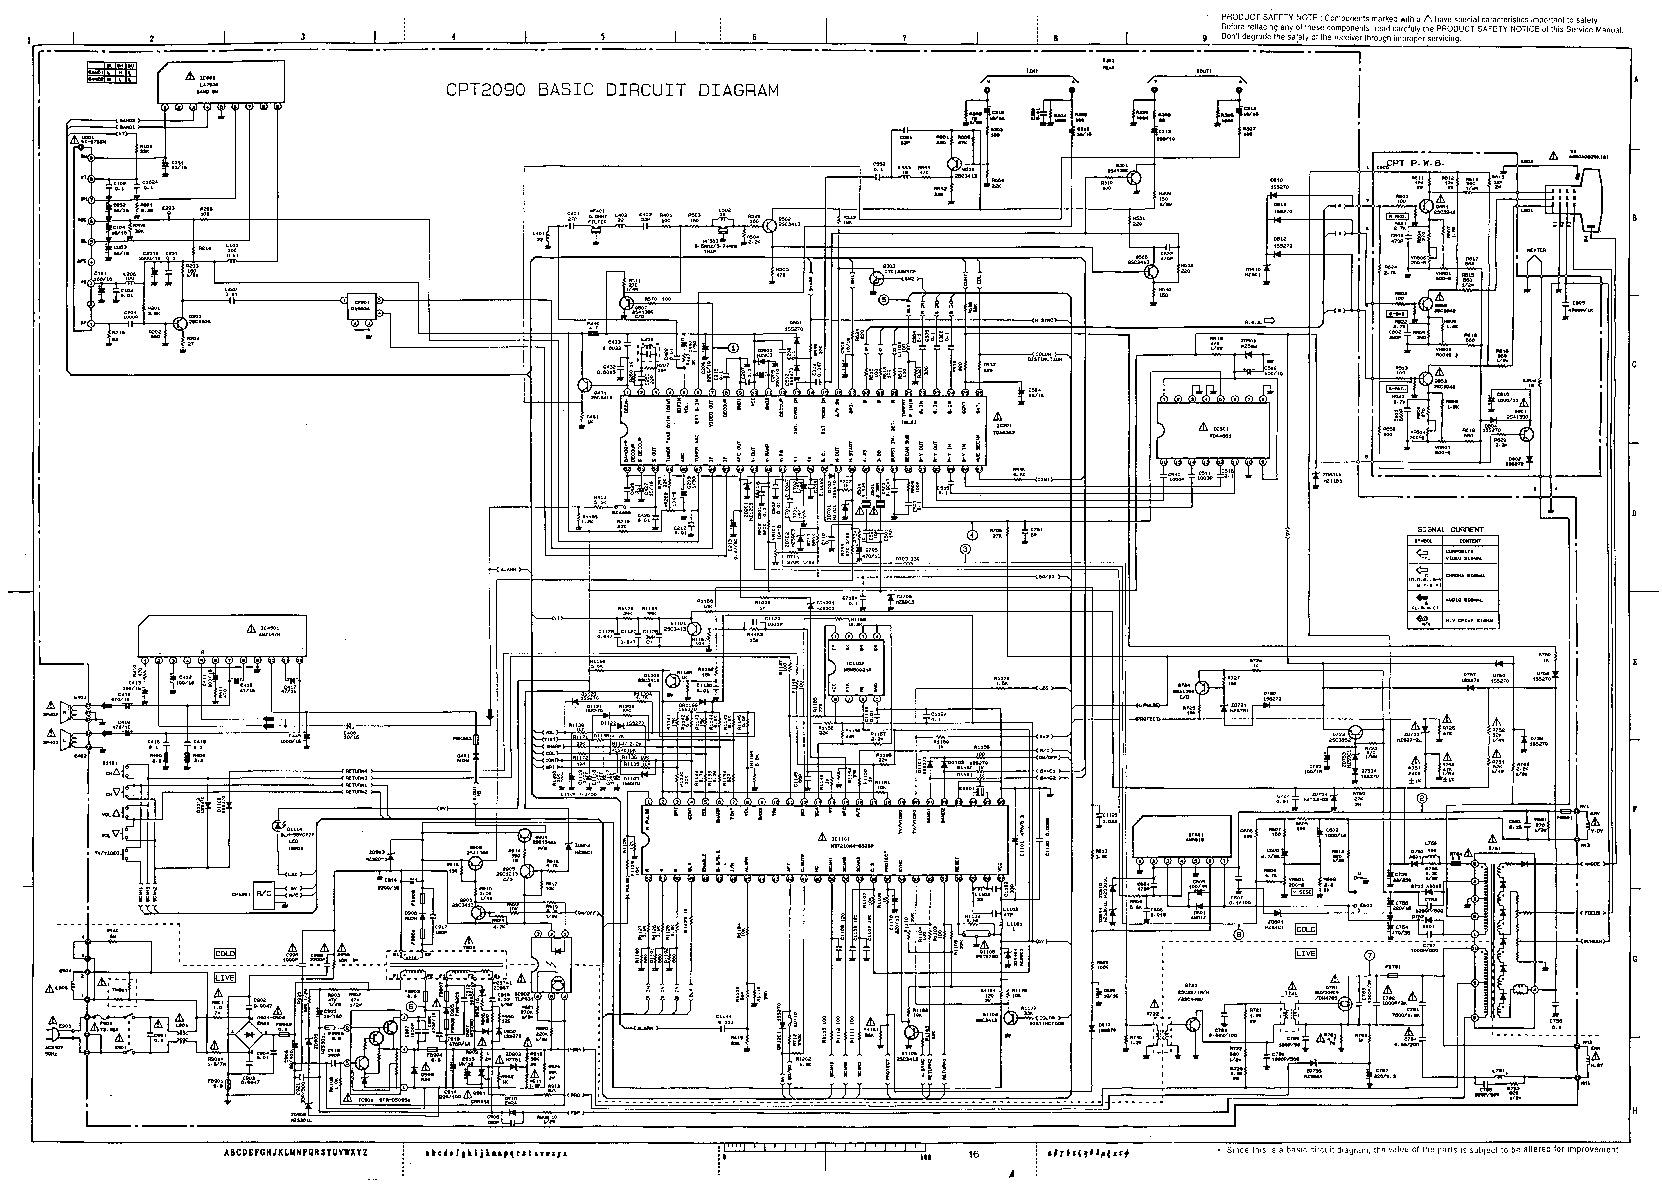 Jvc Tv Diagram, Jvc, Free Engine Image For User Manual